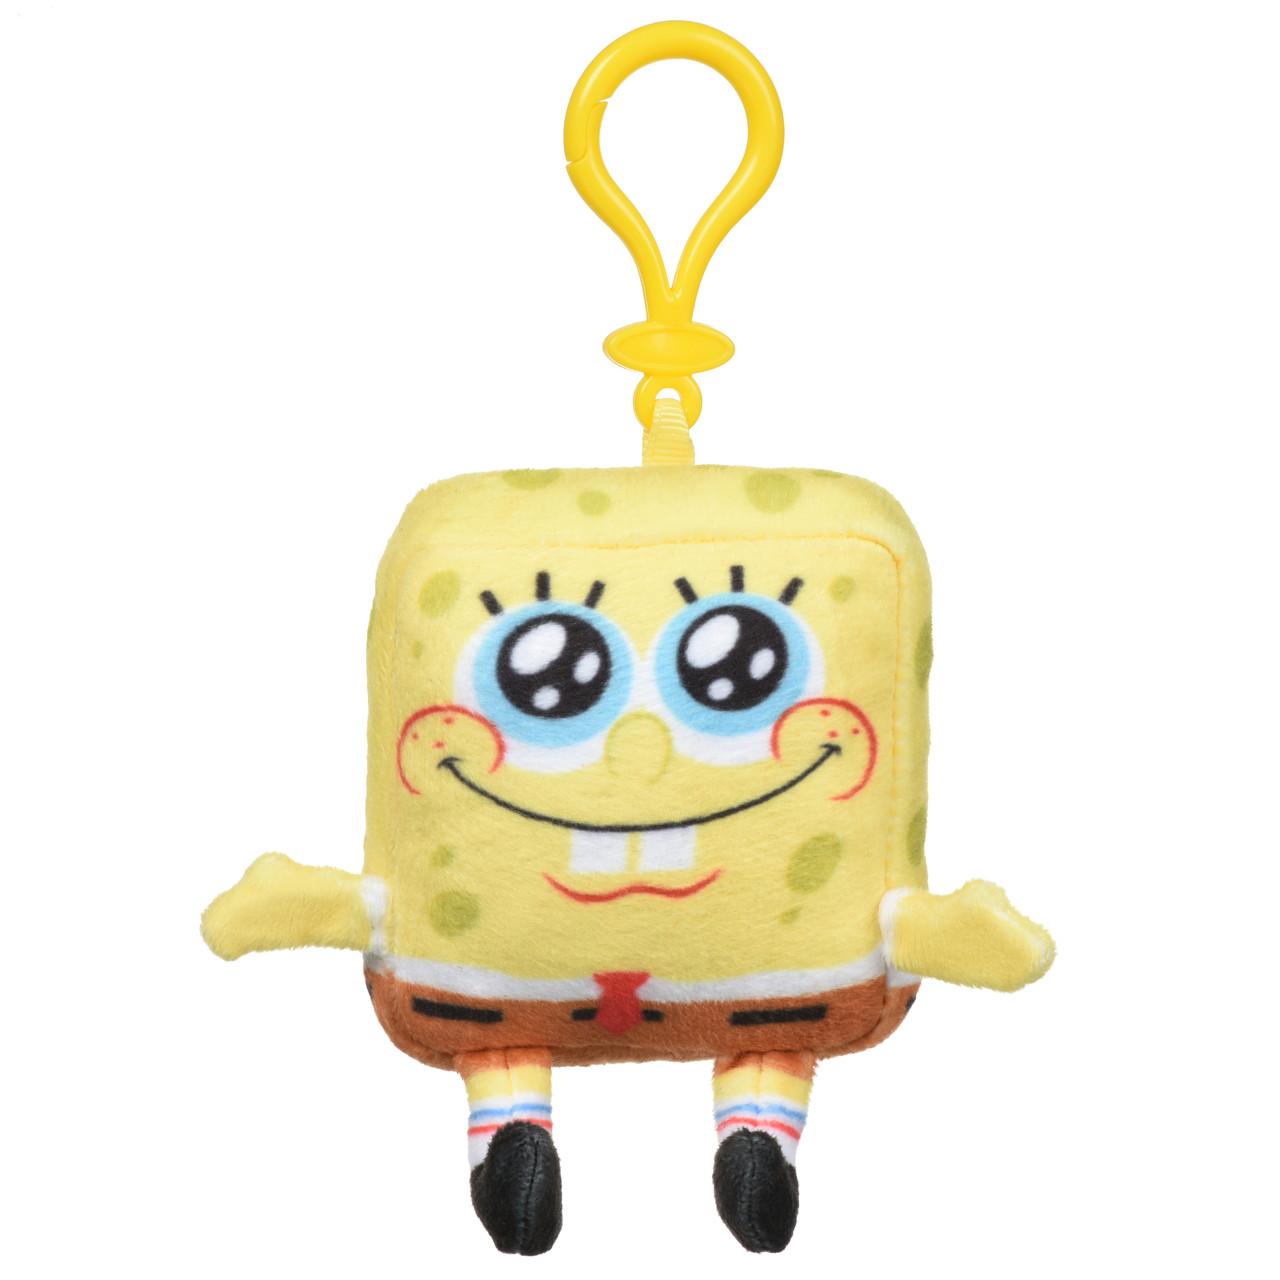 Игрушка-брелок Mini Сlip Plush SpongeBob (Губка Боб), 10 см, «SpongeBob Squarepants» (EU690400-2)